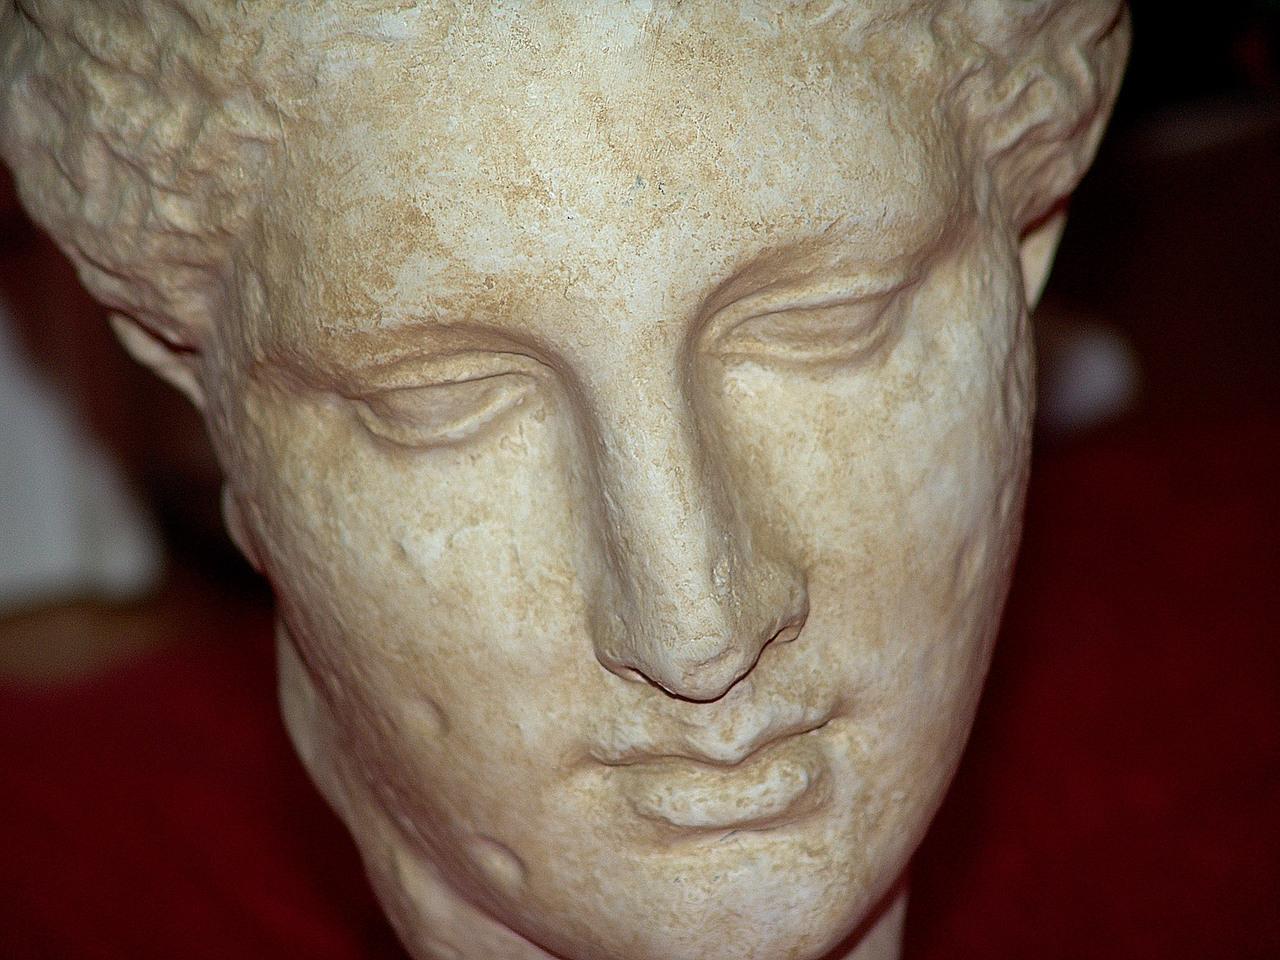 figura grega_vellesa